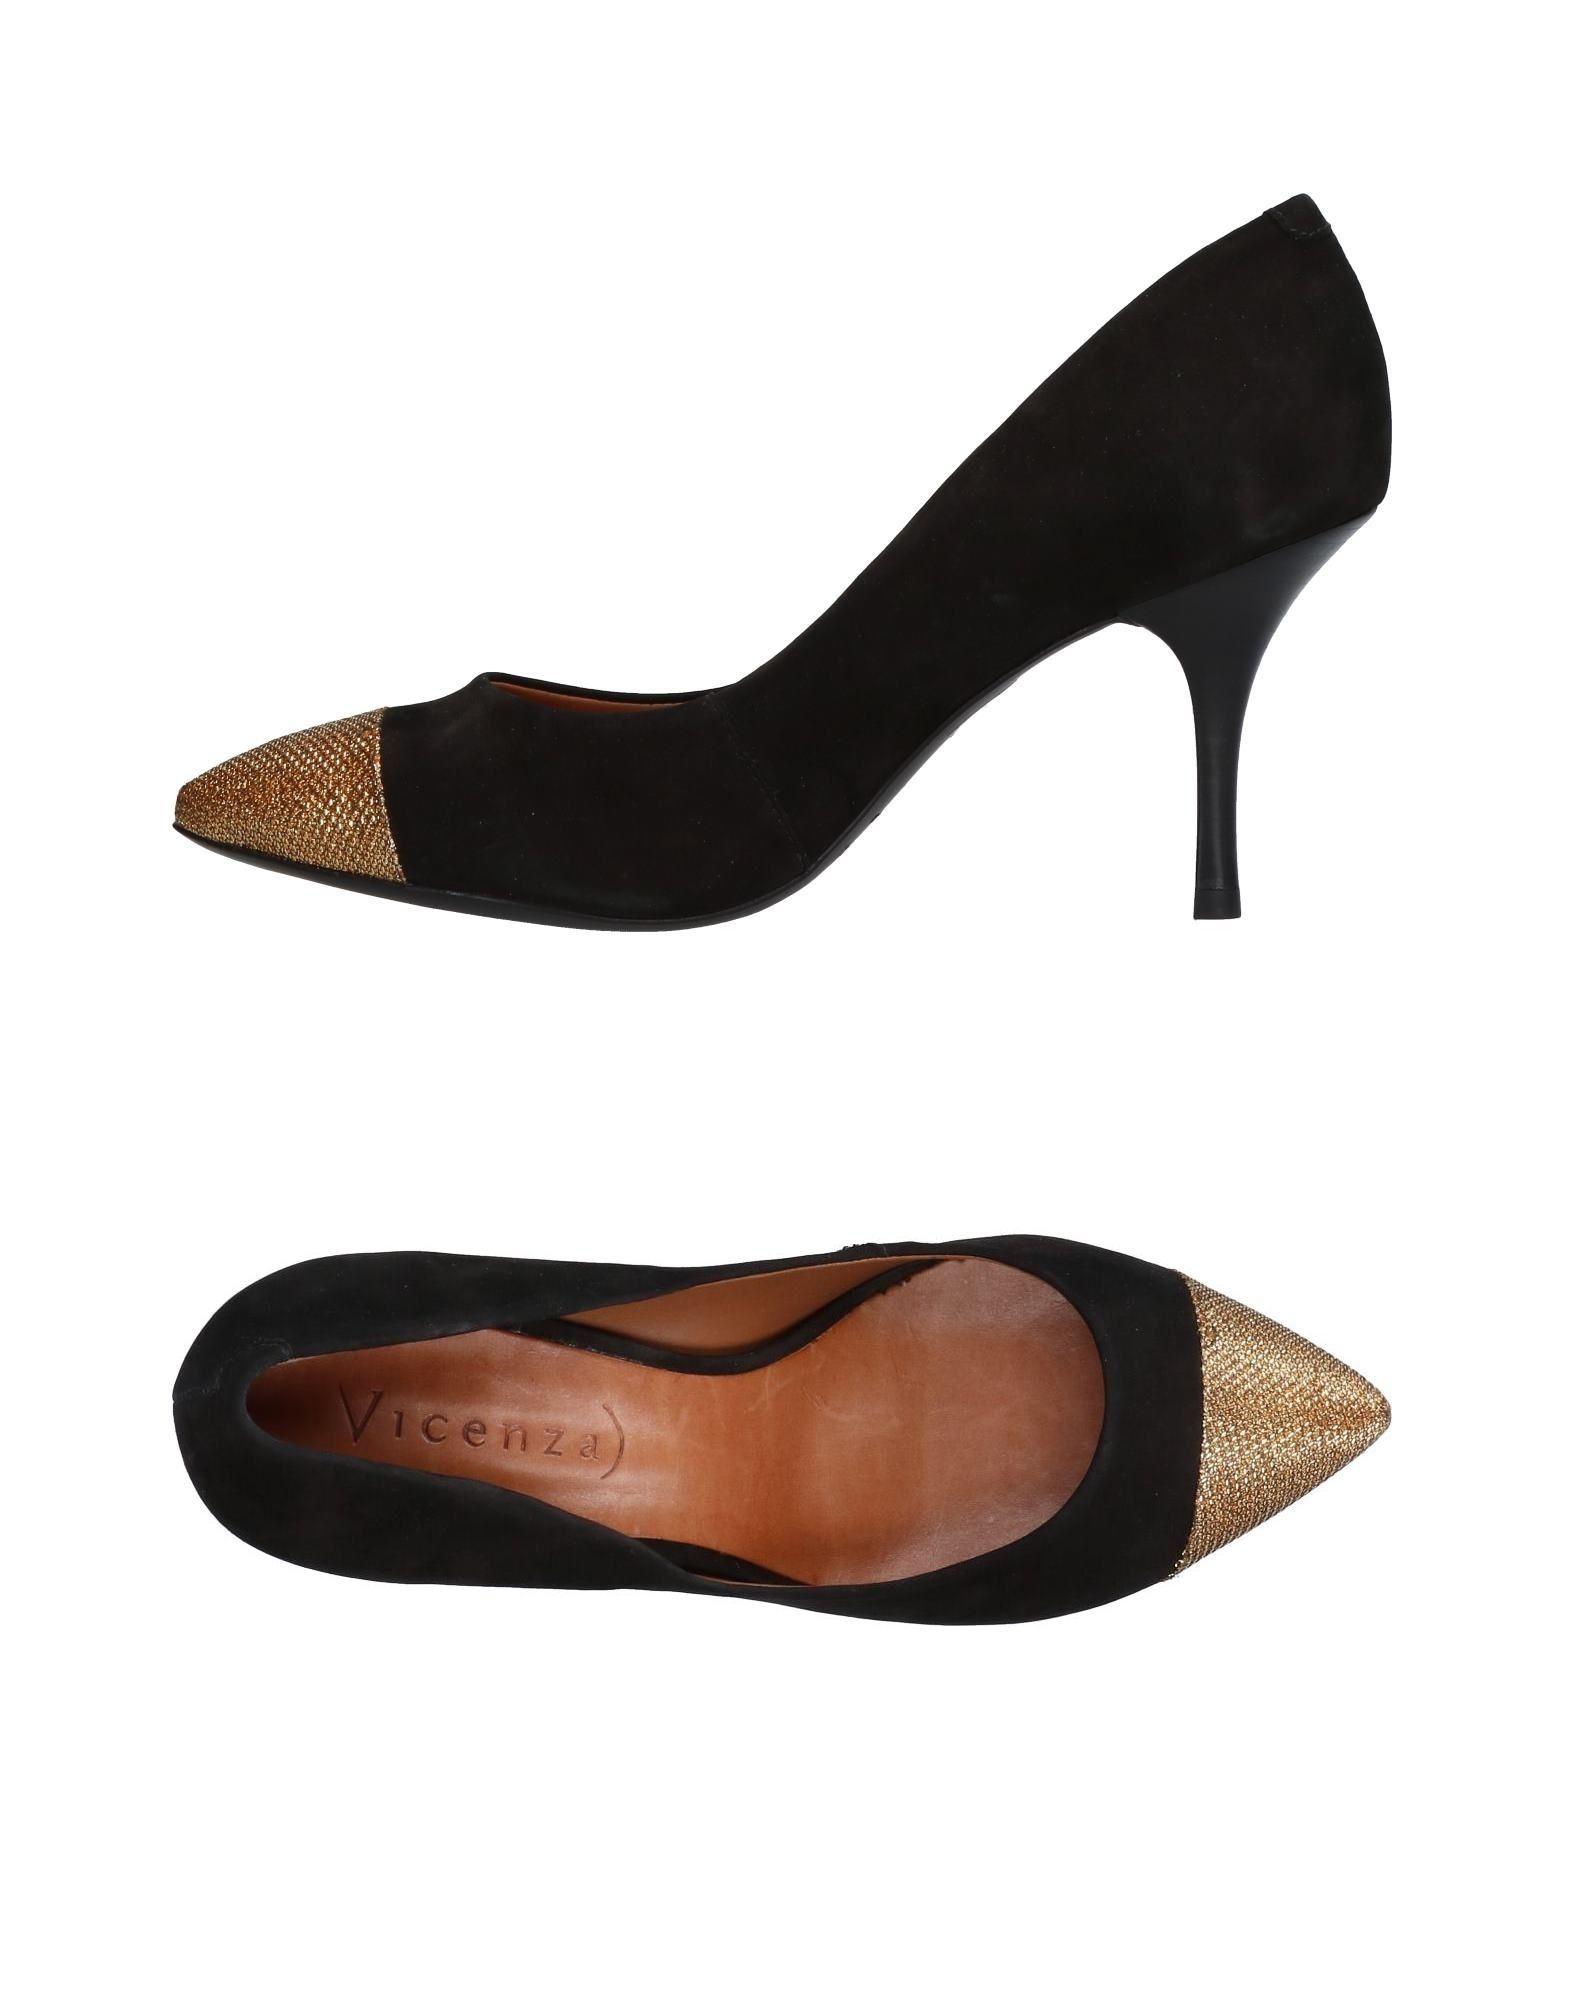 VICENZA) Туфли цены онлайн